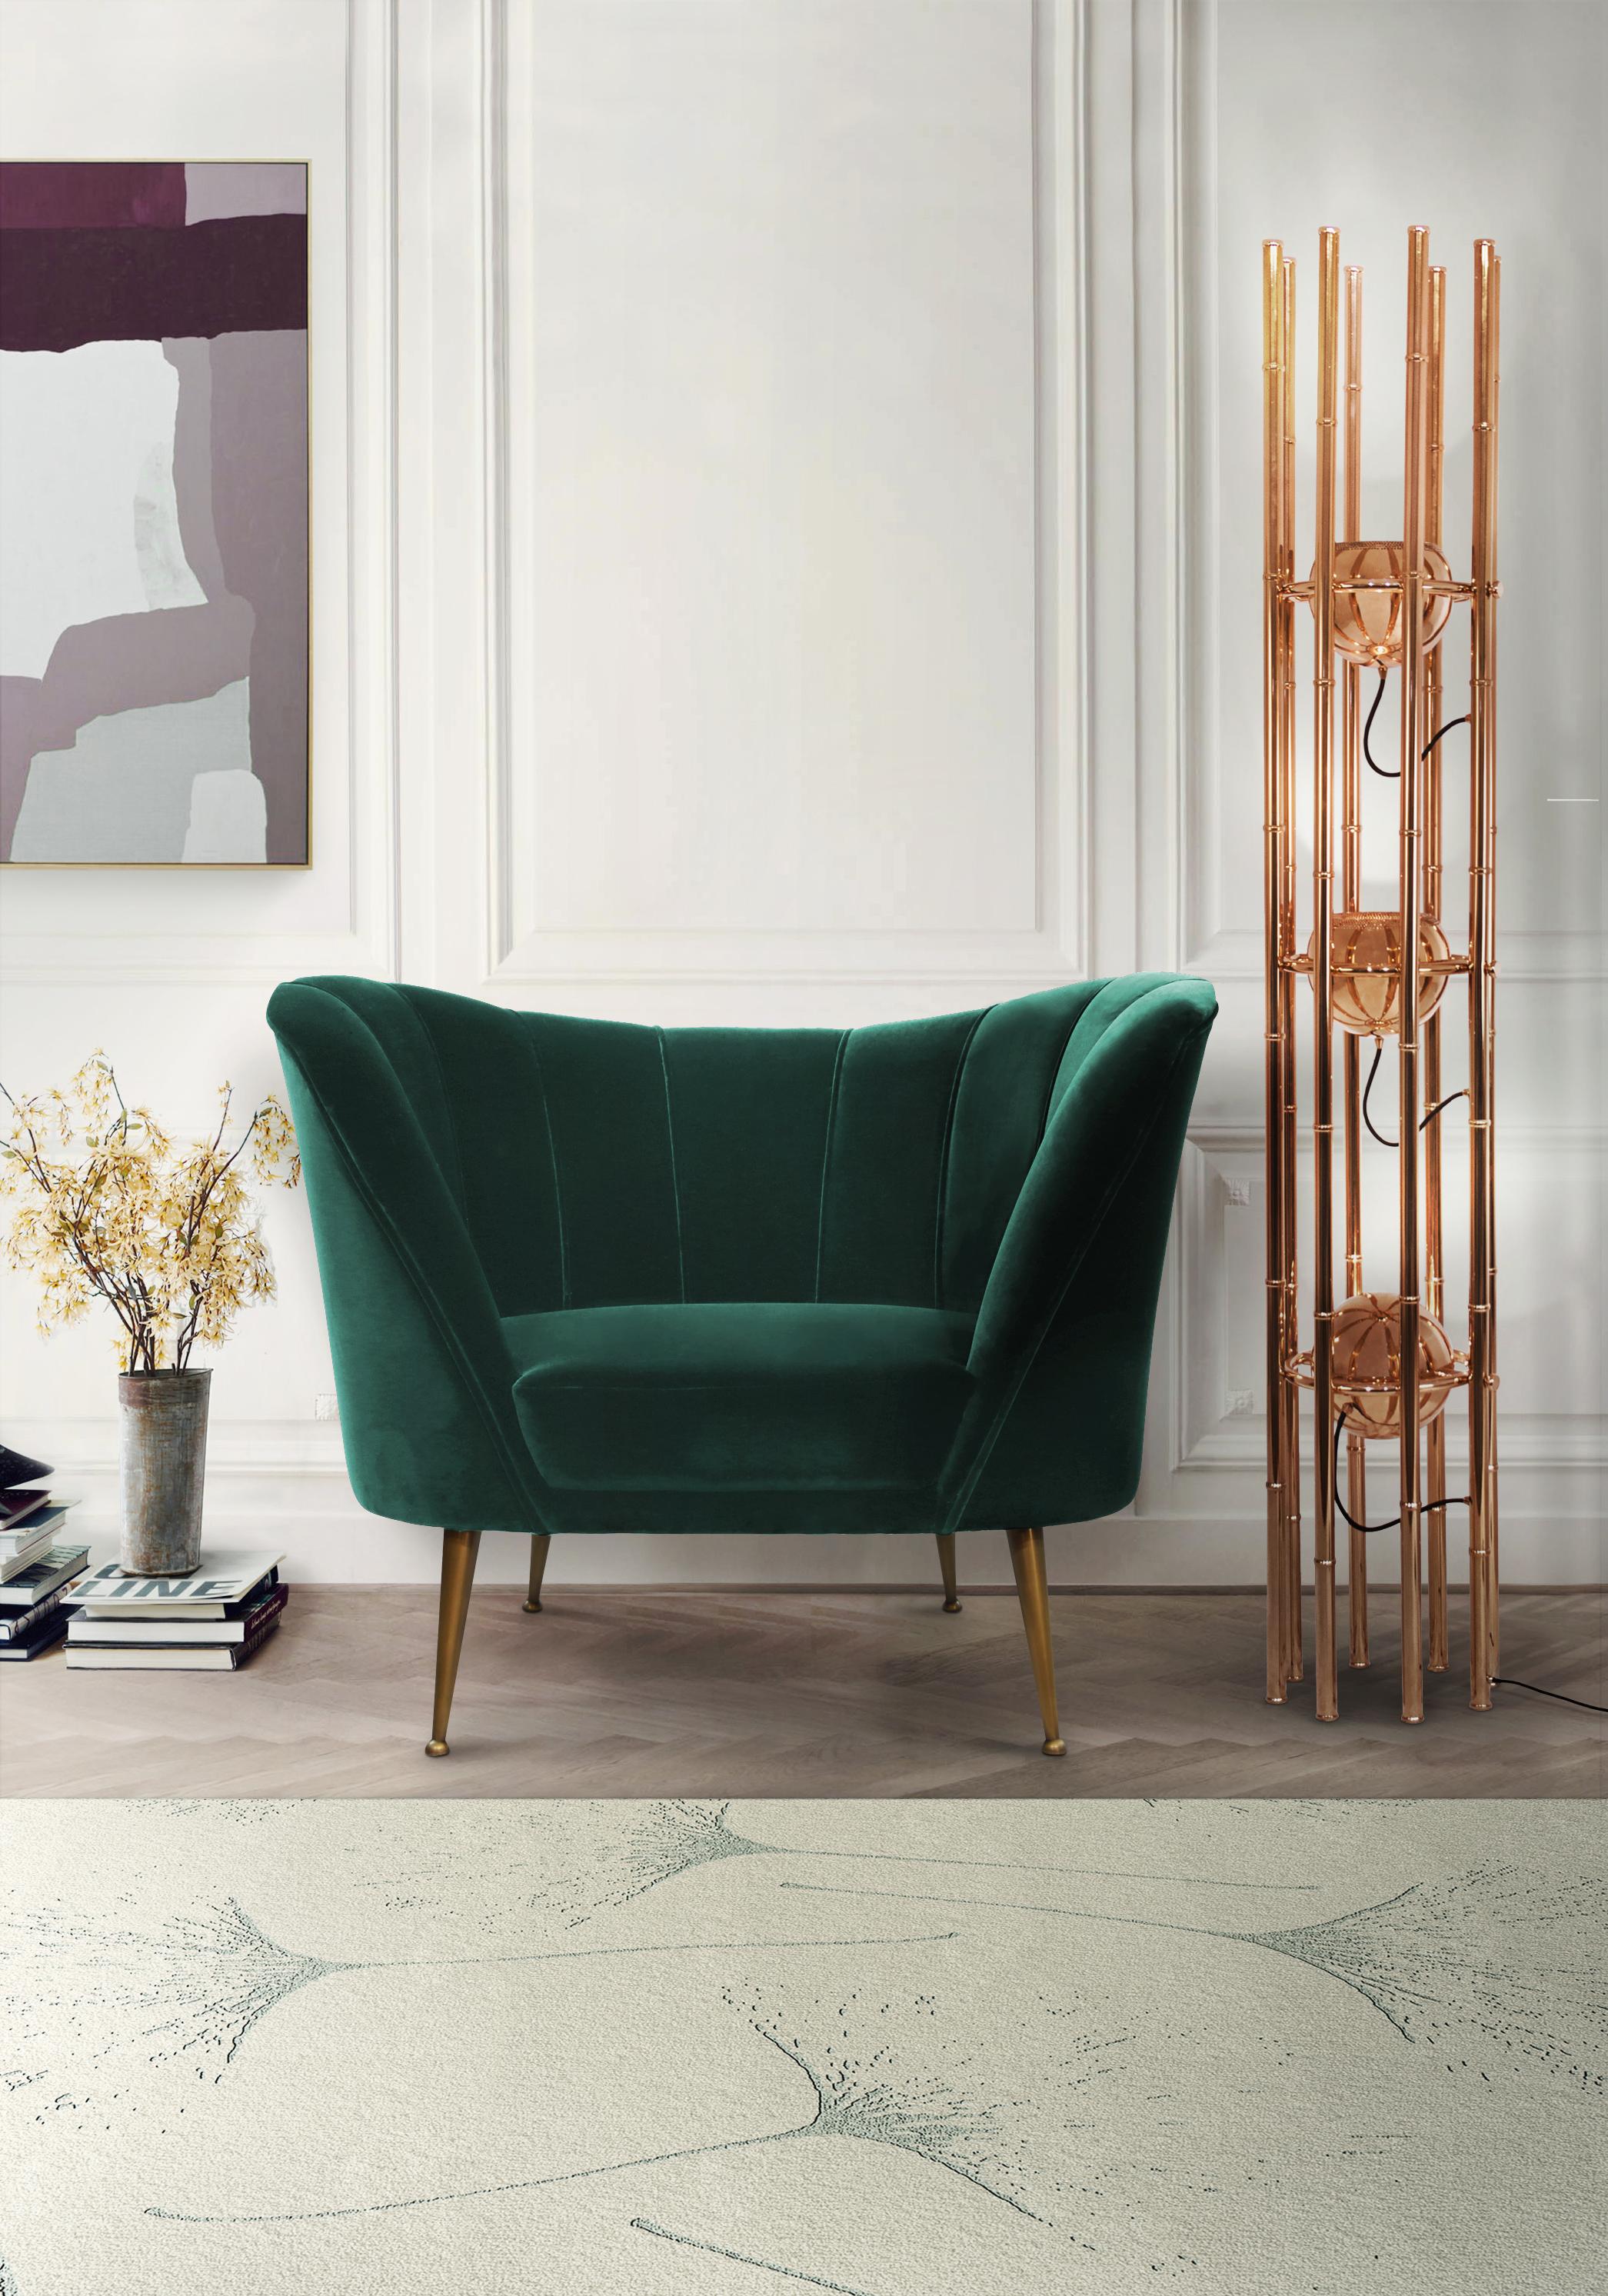 Зеленый Зеленый Зеленый в интерьере: наиболее выигрышные варианты brabbu ambience press 59 HR